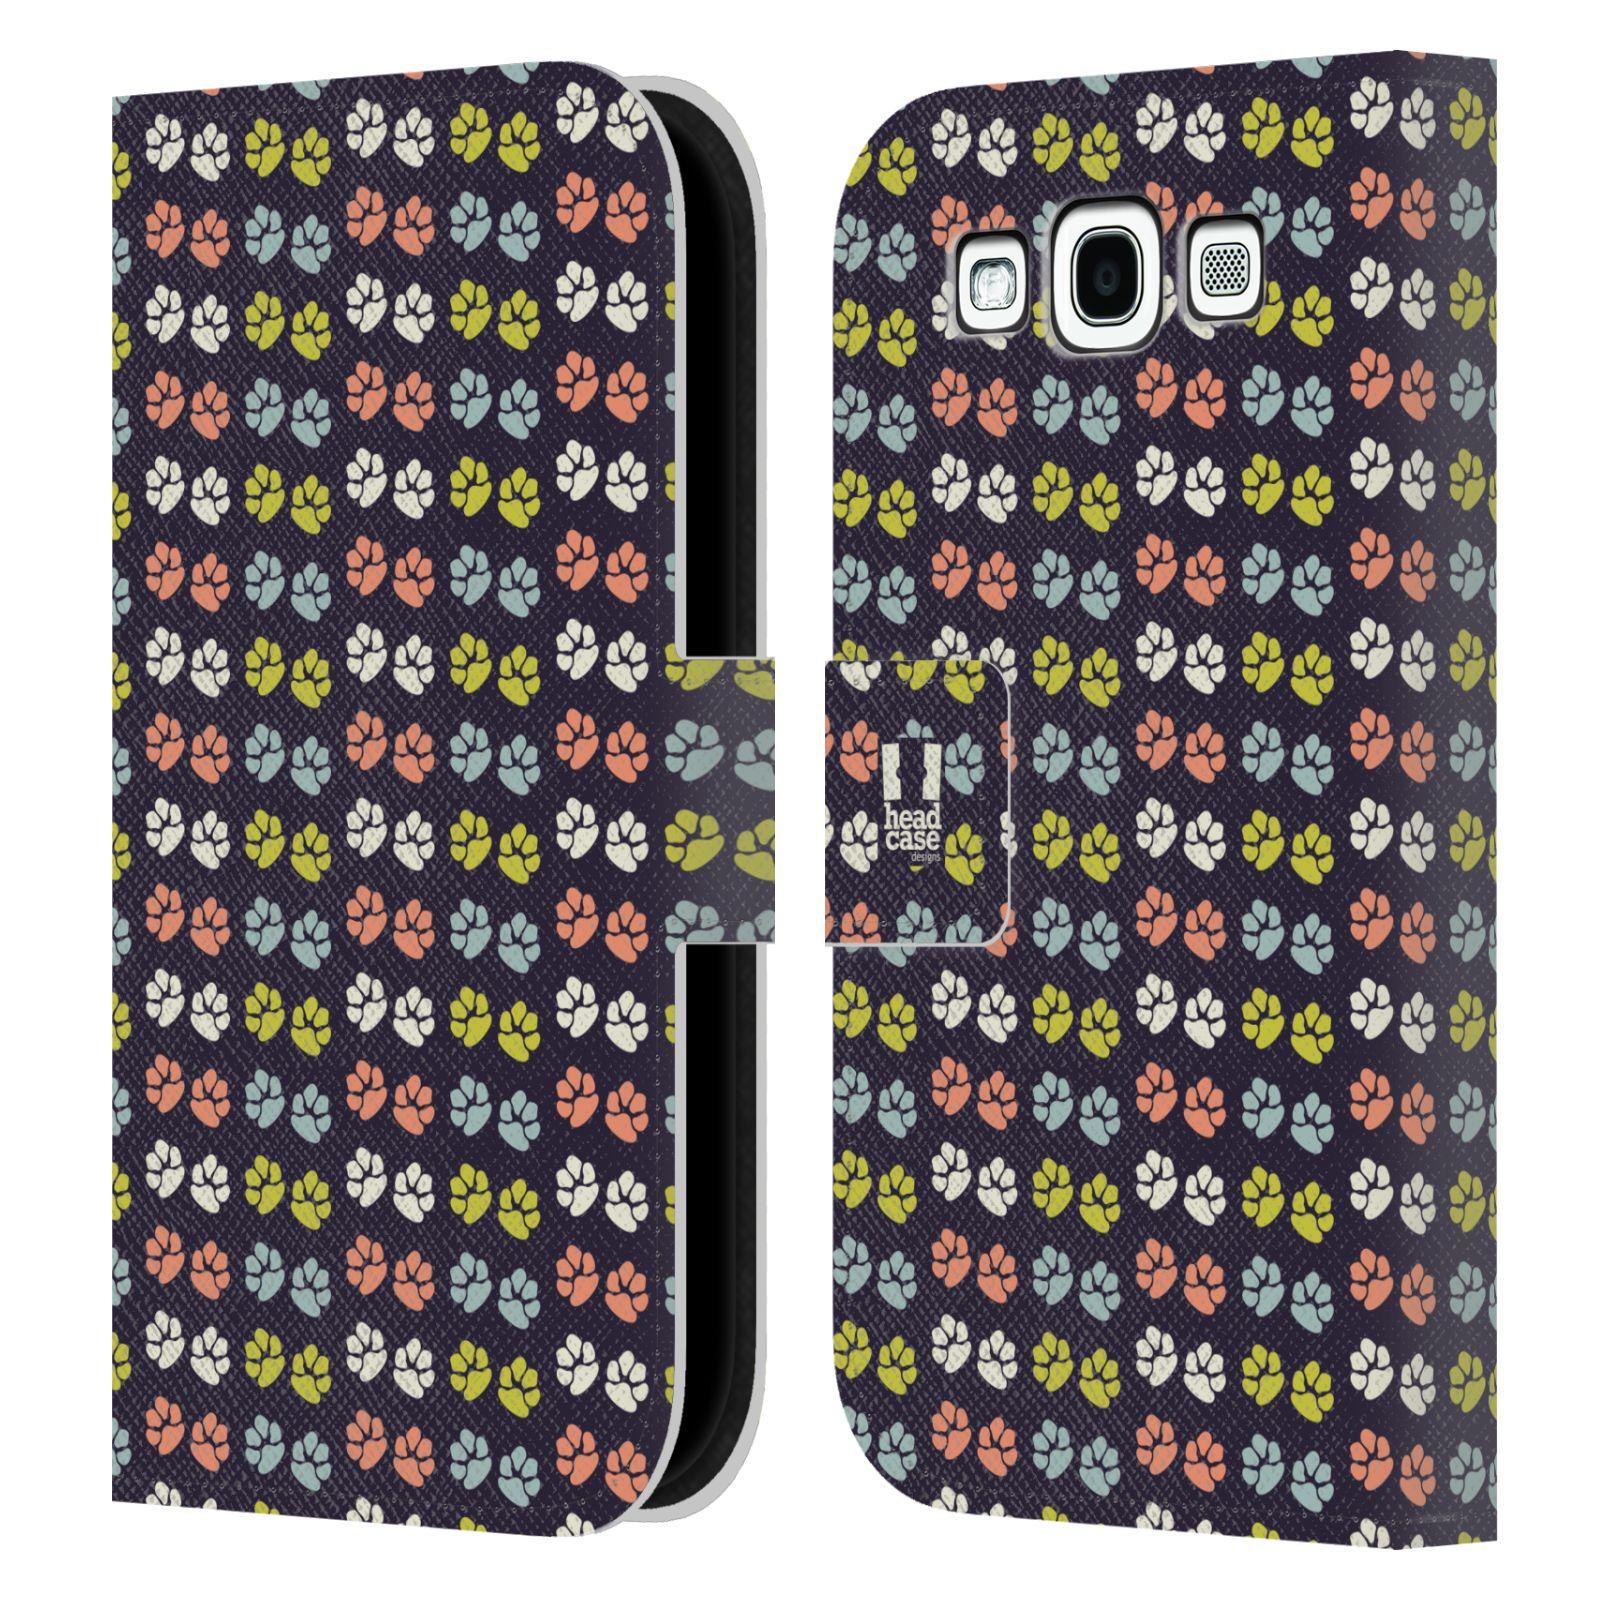 HEAD CASE Flipové pouzdro pro mobil Samsung Galaxy S3 Pejsek ťapky barevné RETRO